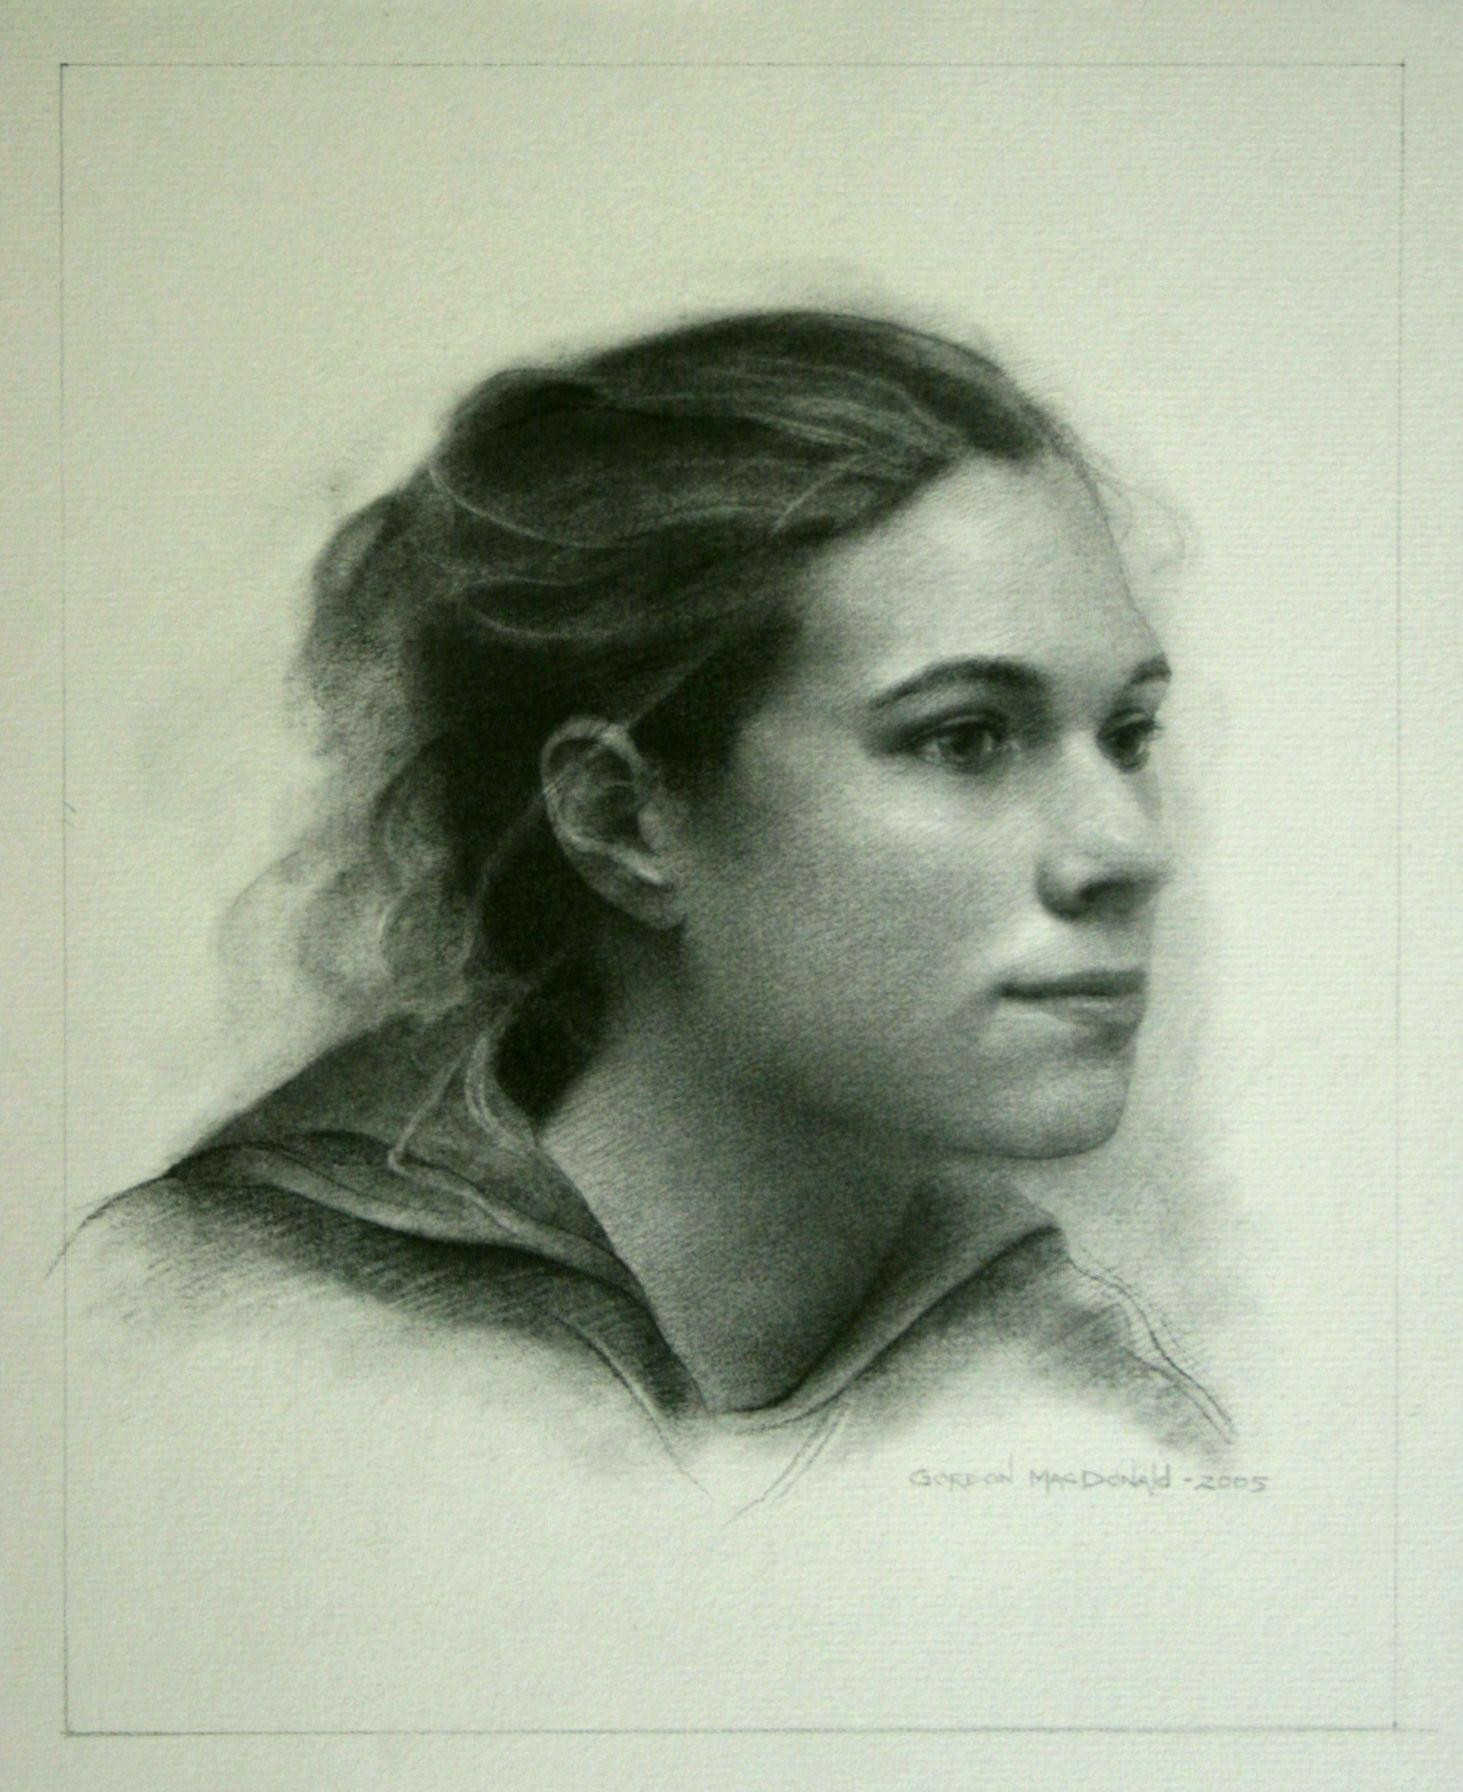 005 A rejected portrait. Gord MacDonald / charcoal on paper